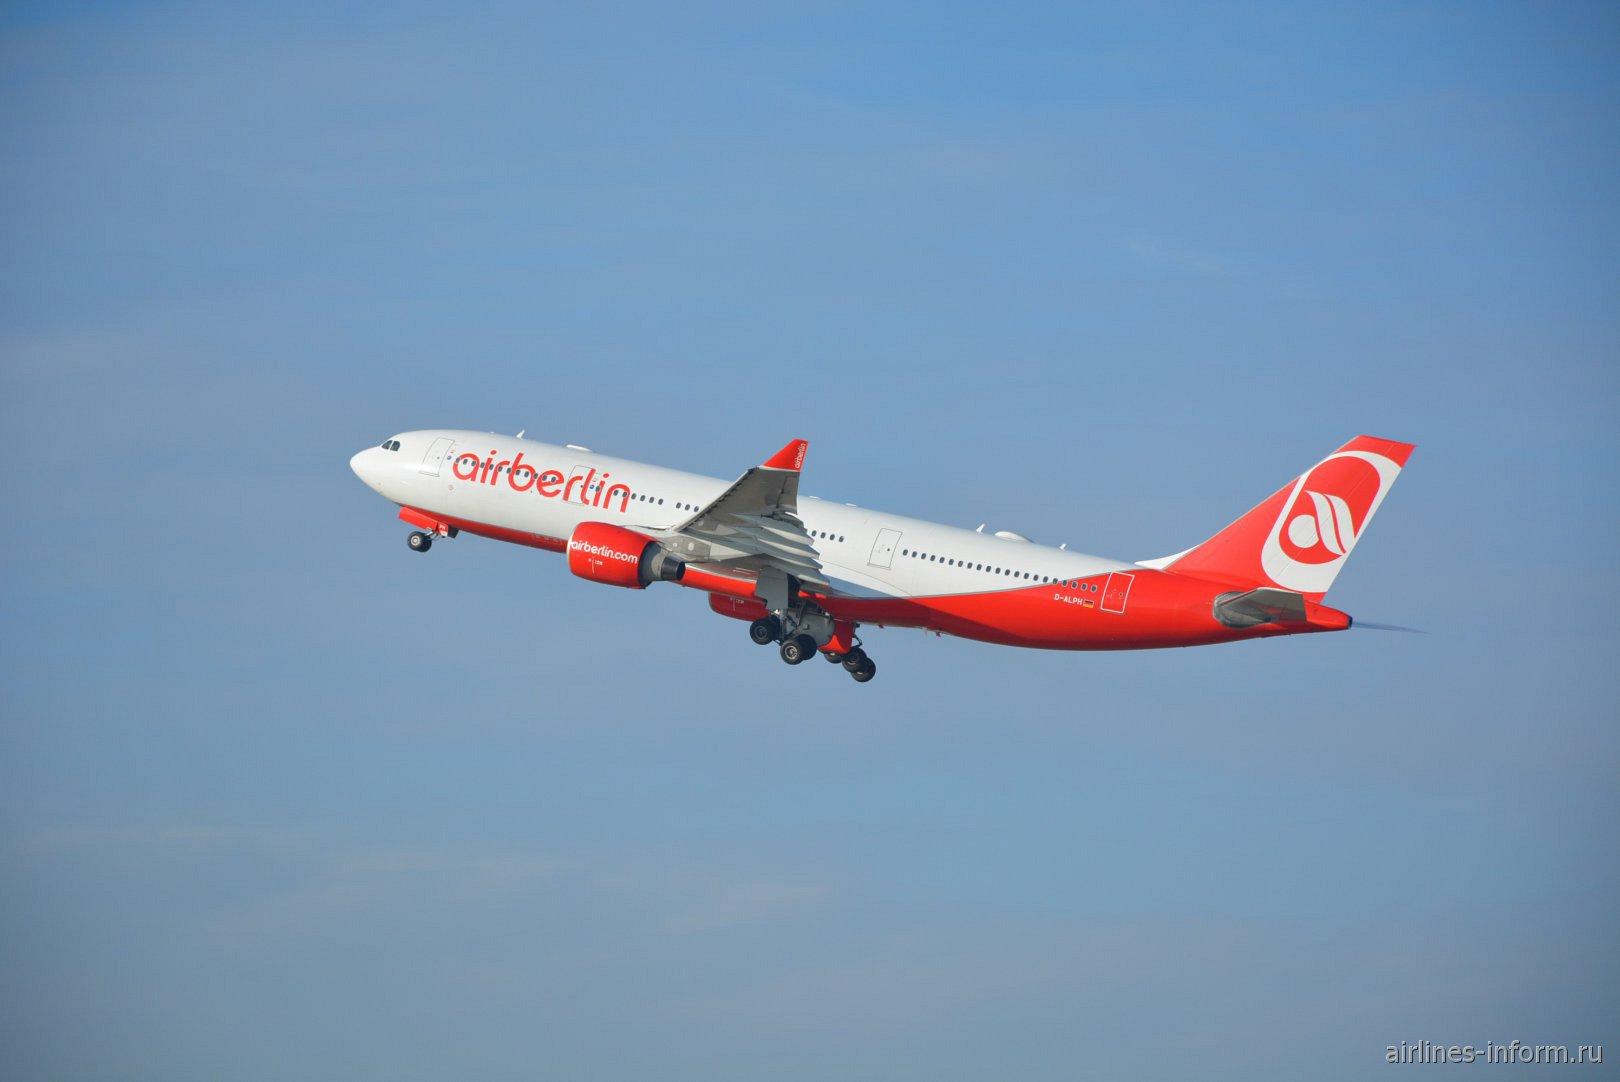 Взлет самолета Airbus A330-200 авиакомпании airberlin